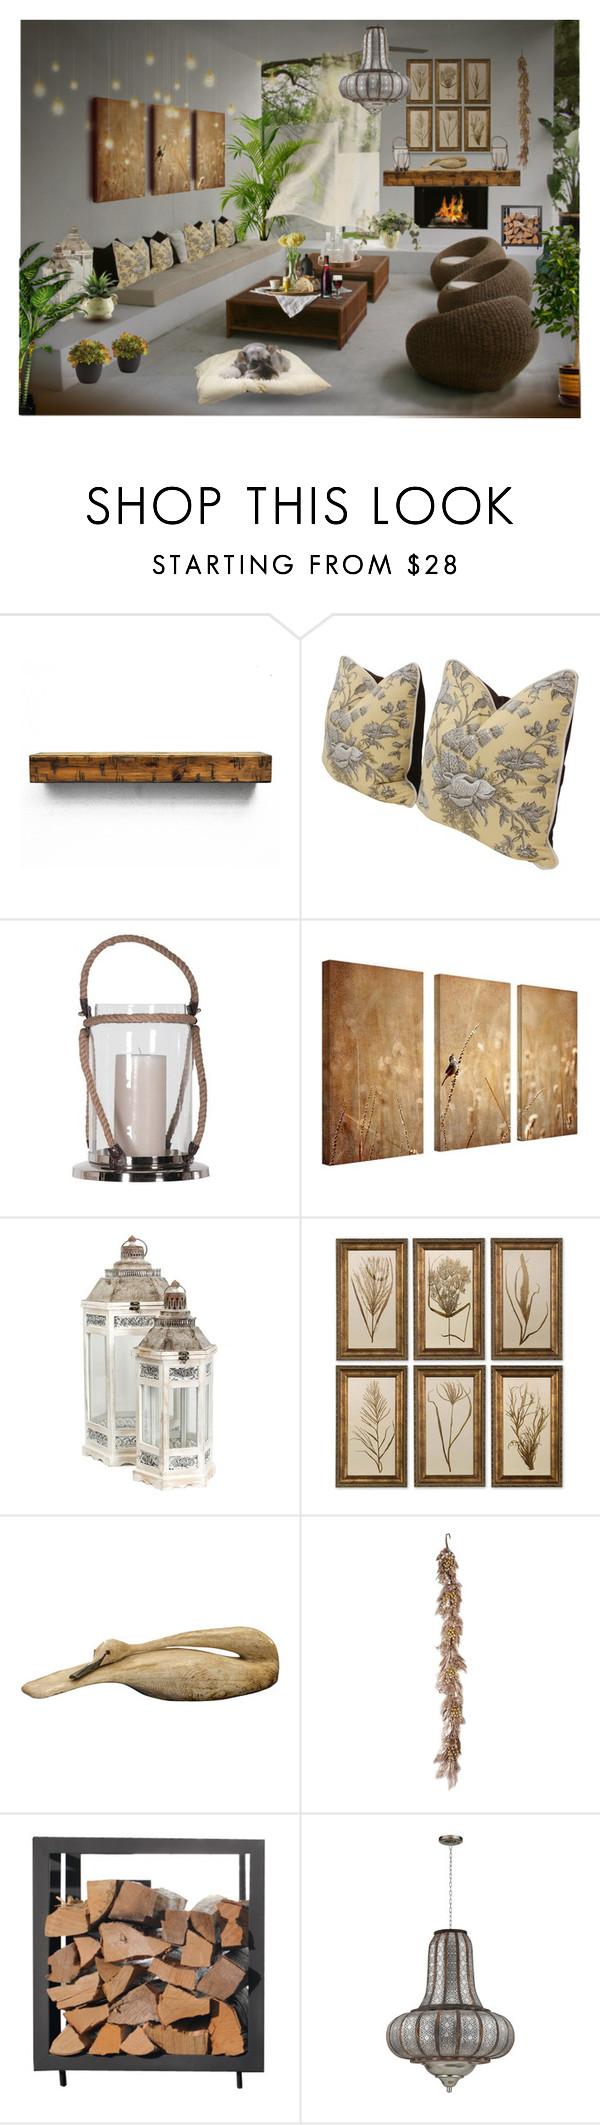 """Sin título #376"" by yblacasa on Polyvore featuring interior, interiors, interior design, hogar, home decor, interior decorating y Uttermost"